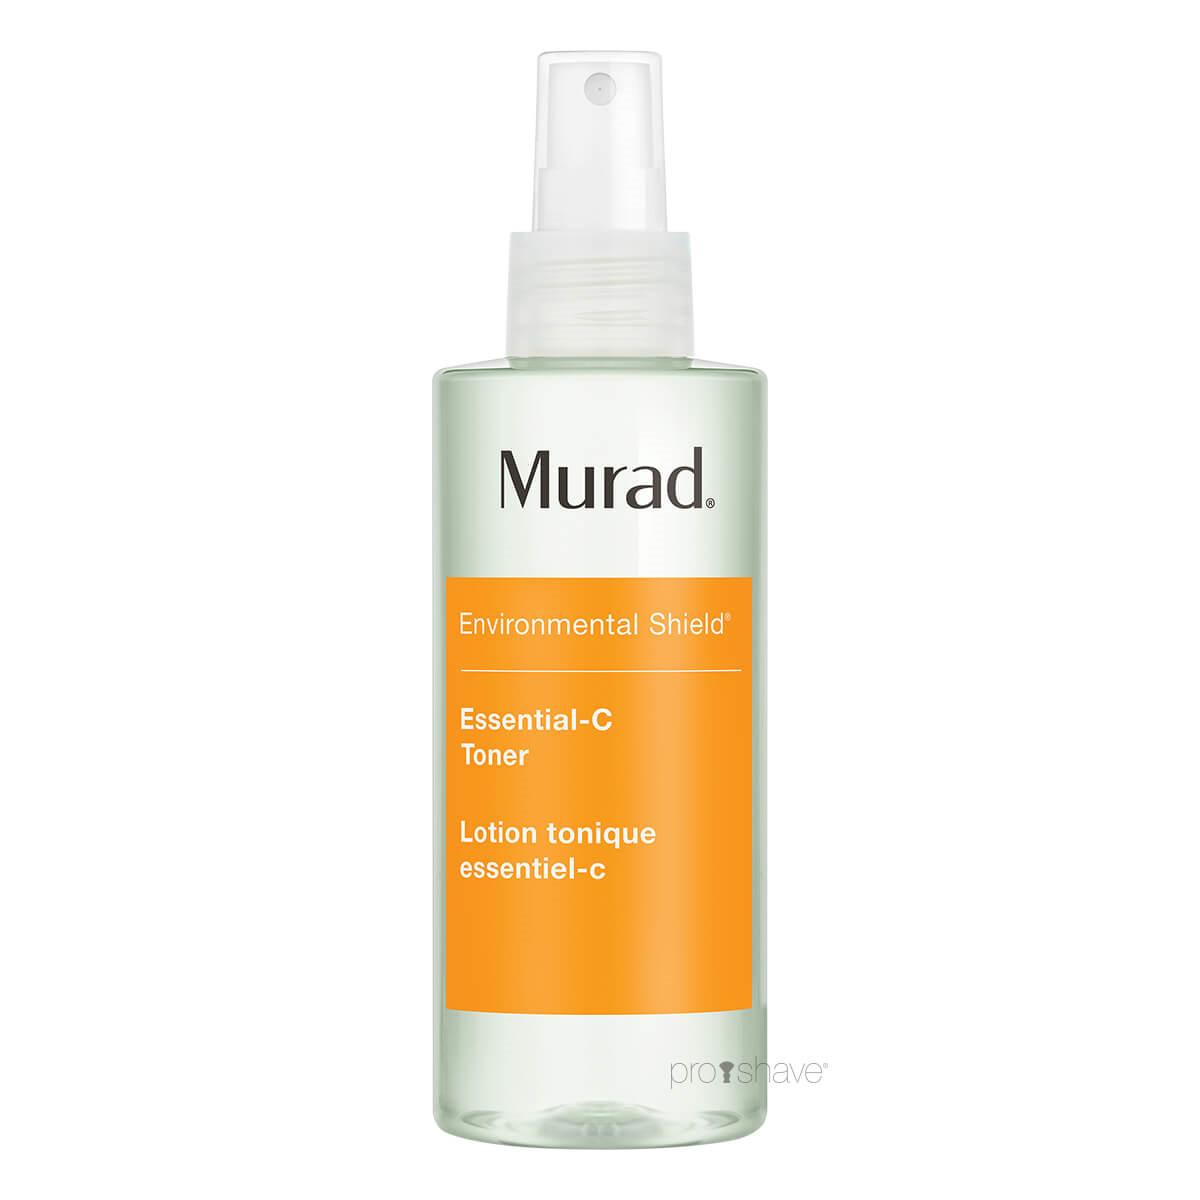 Murad Essential-C Toner, Environmental Shield, 180 Ml.